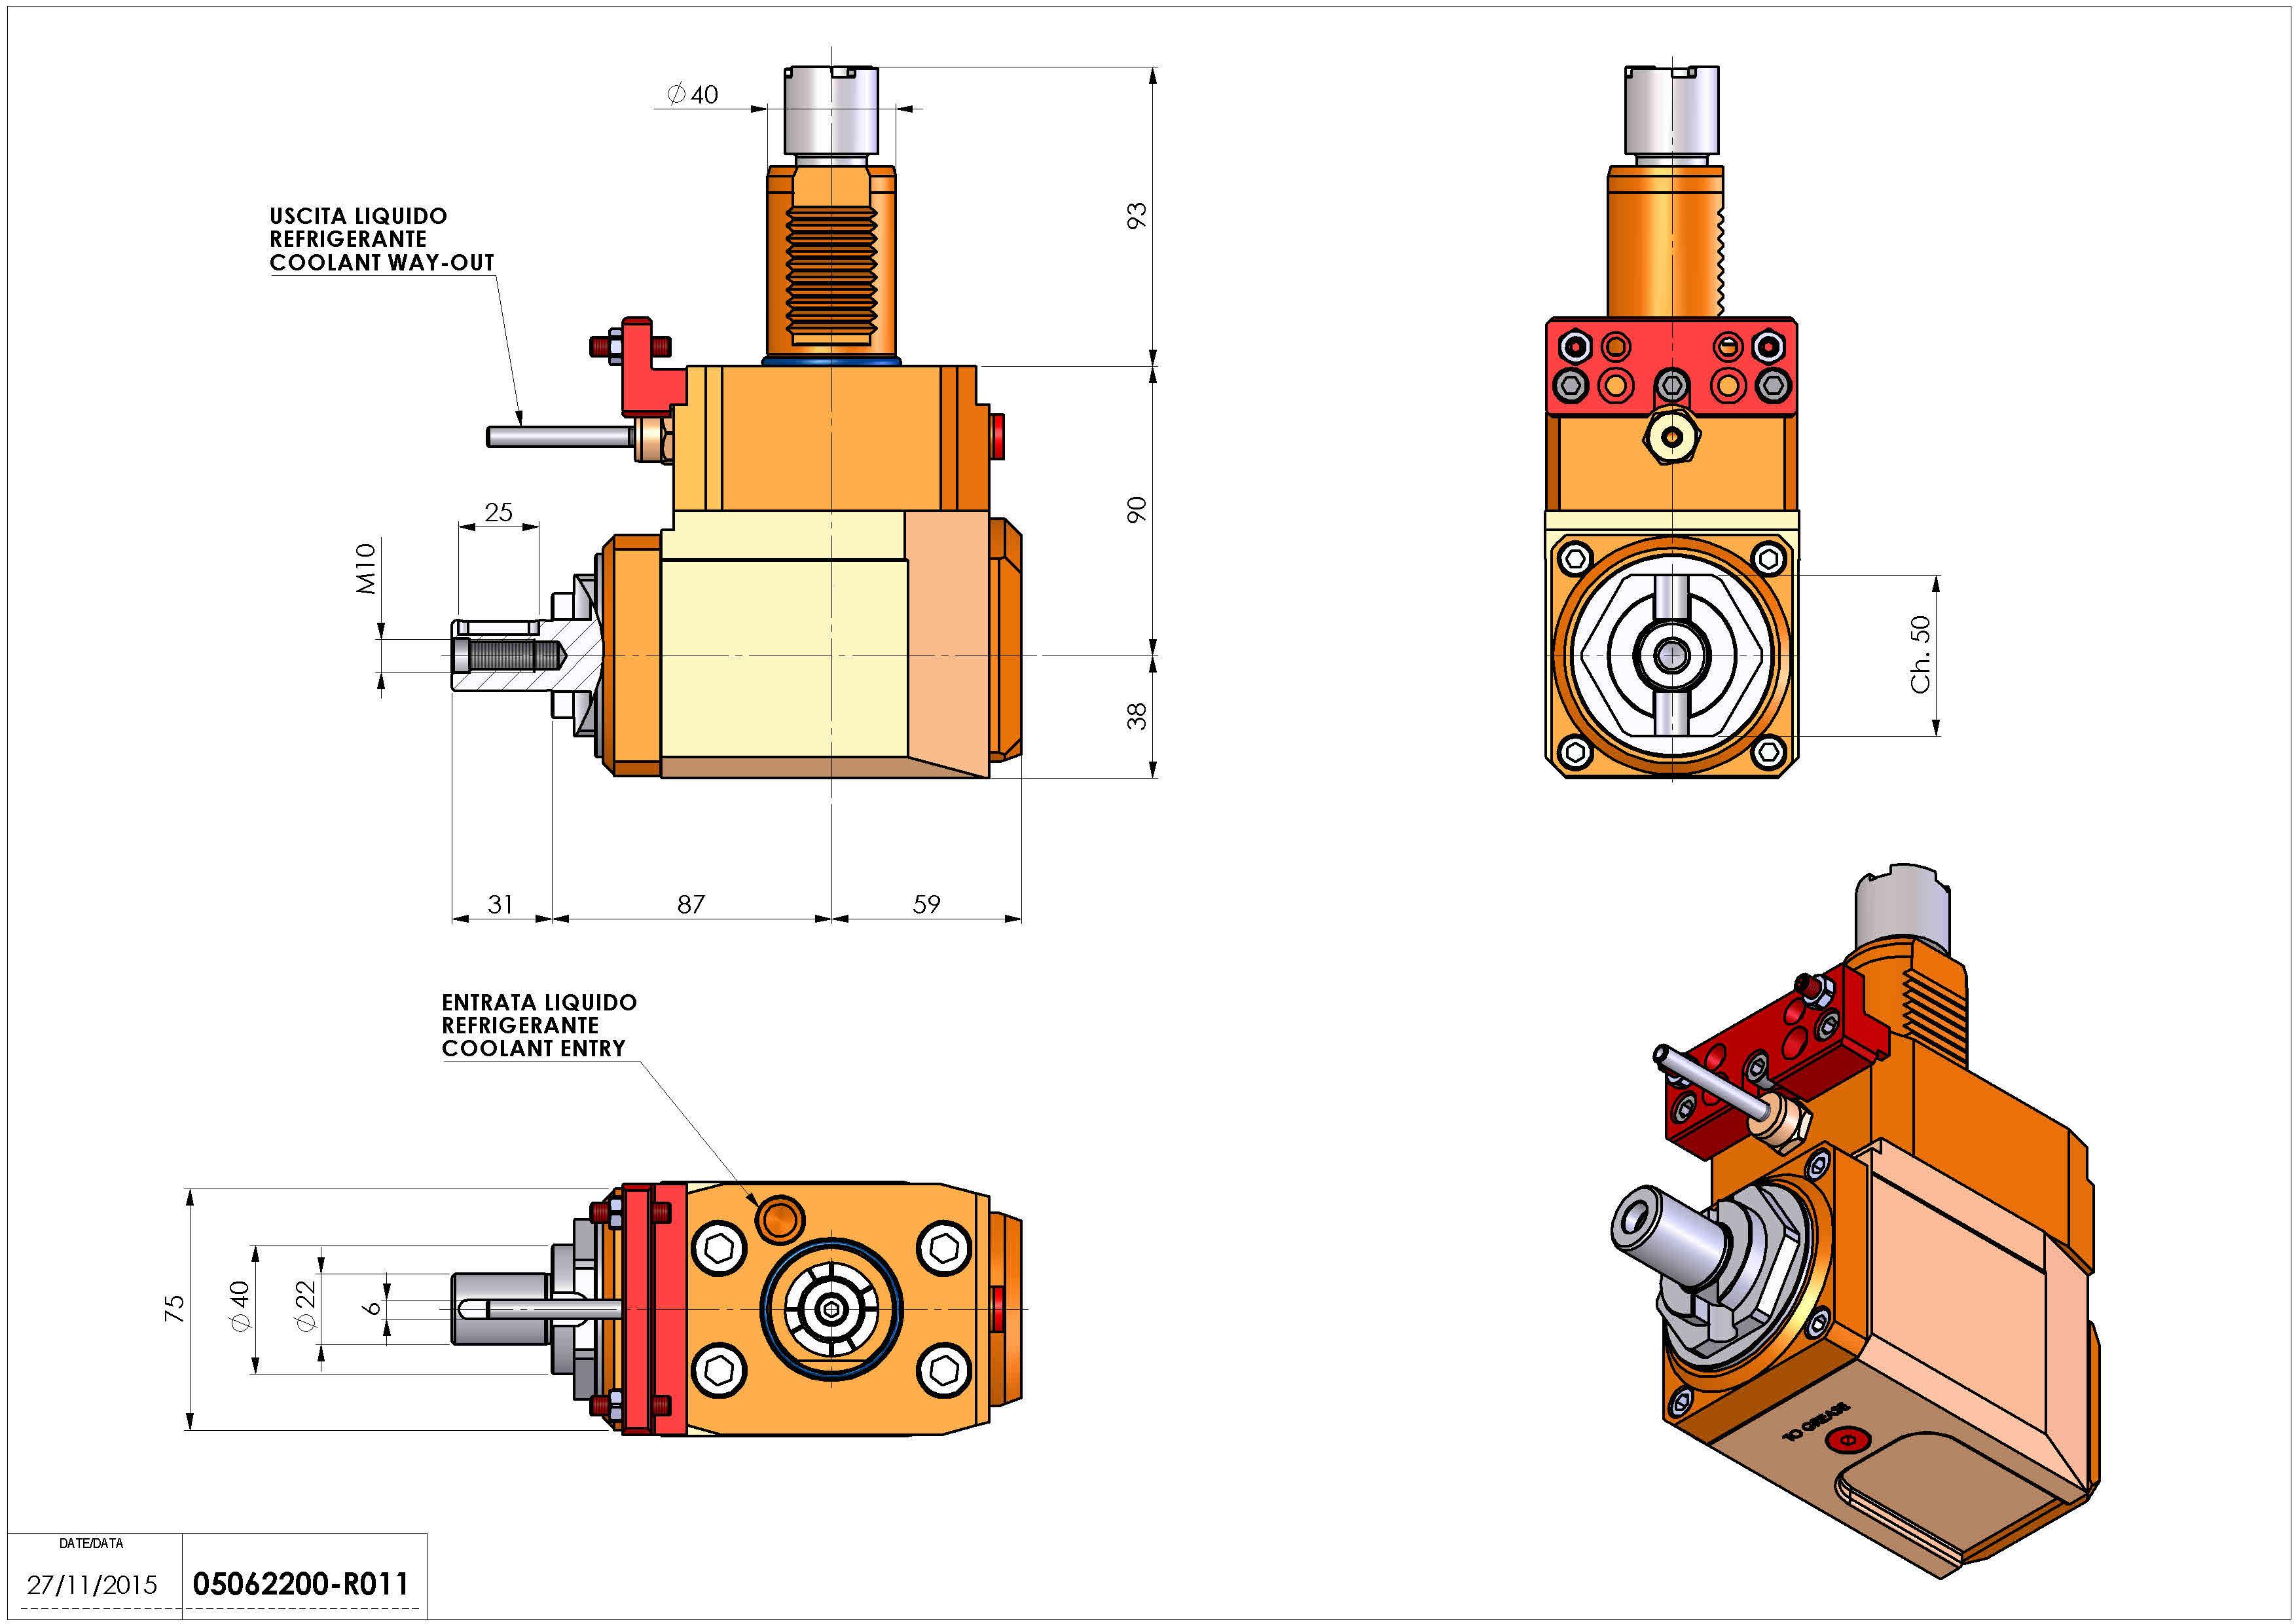 Technical image - LT-A VDI40 DIN138-22 R H90 OK.